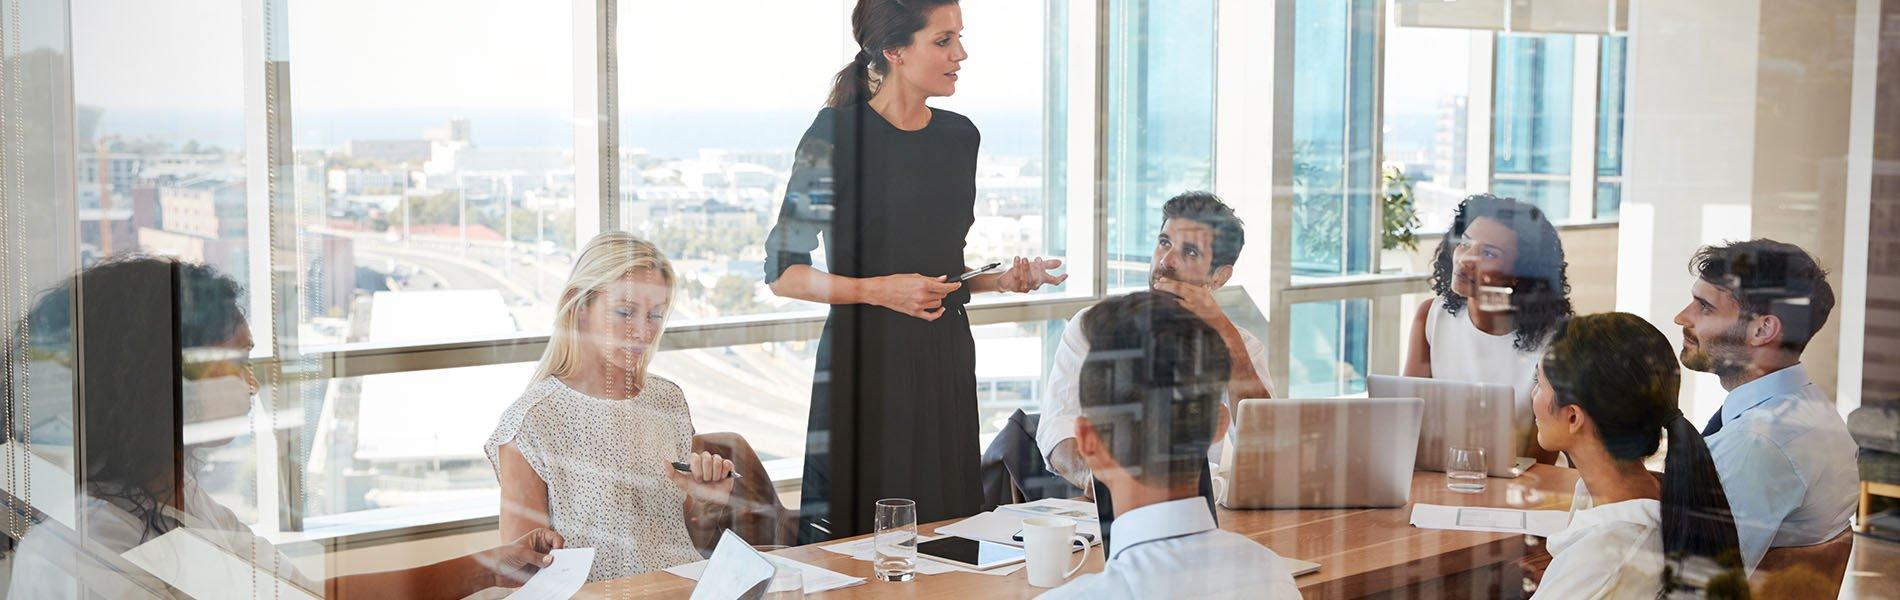 blog post-PM - 5 Key Metrics Every Business Owner Should Track.jpg